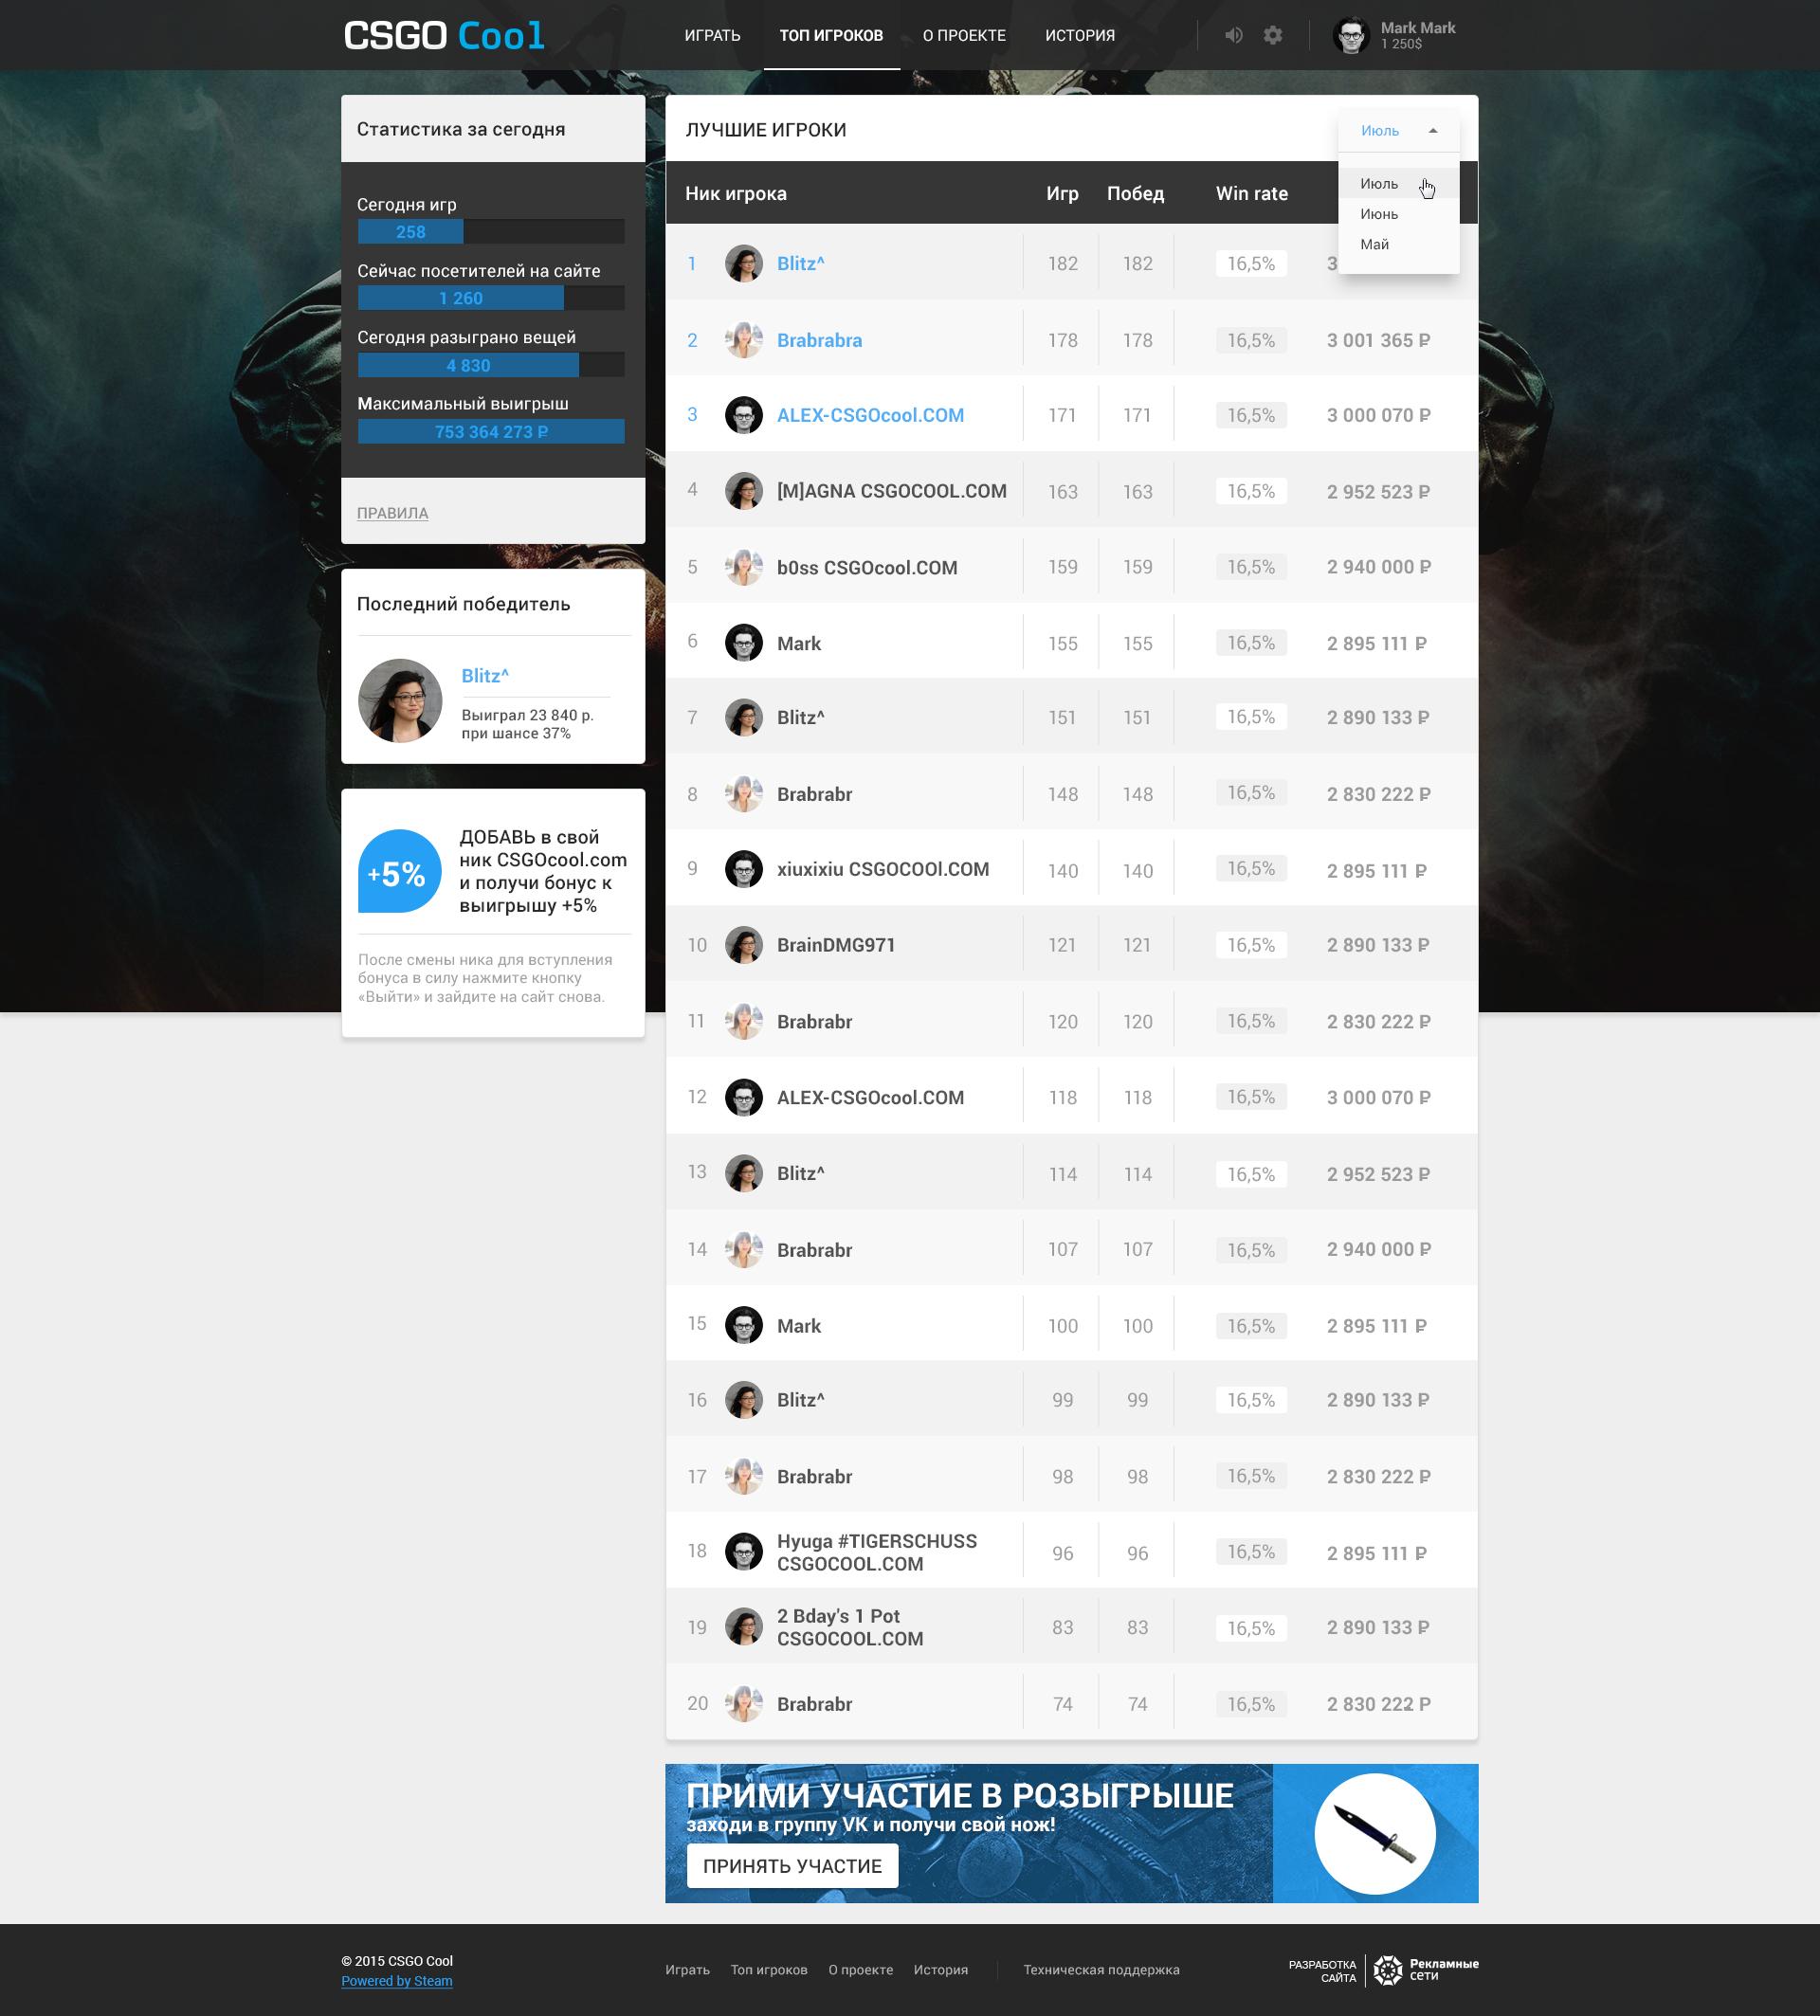 Сайт Csgocool.com (Laravel, Node.js, Vue.js)